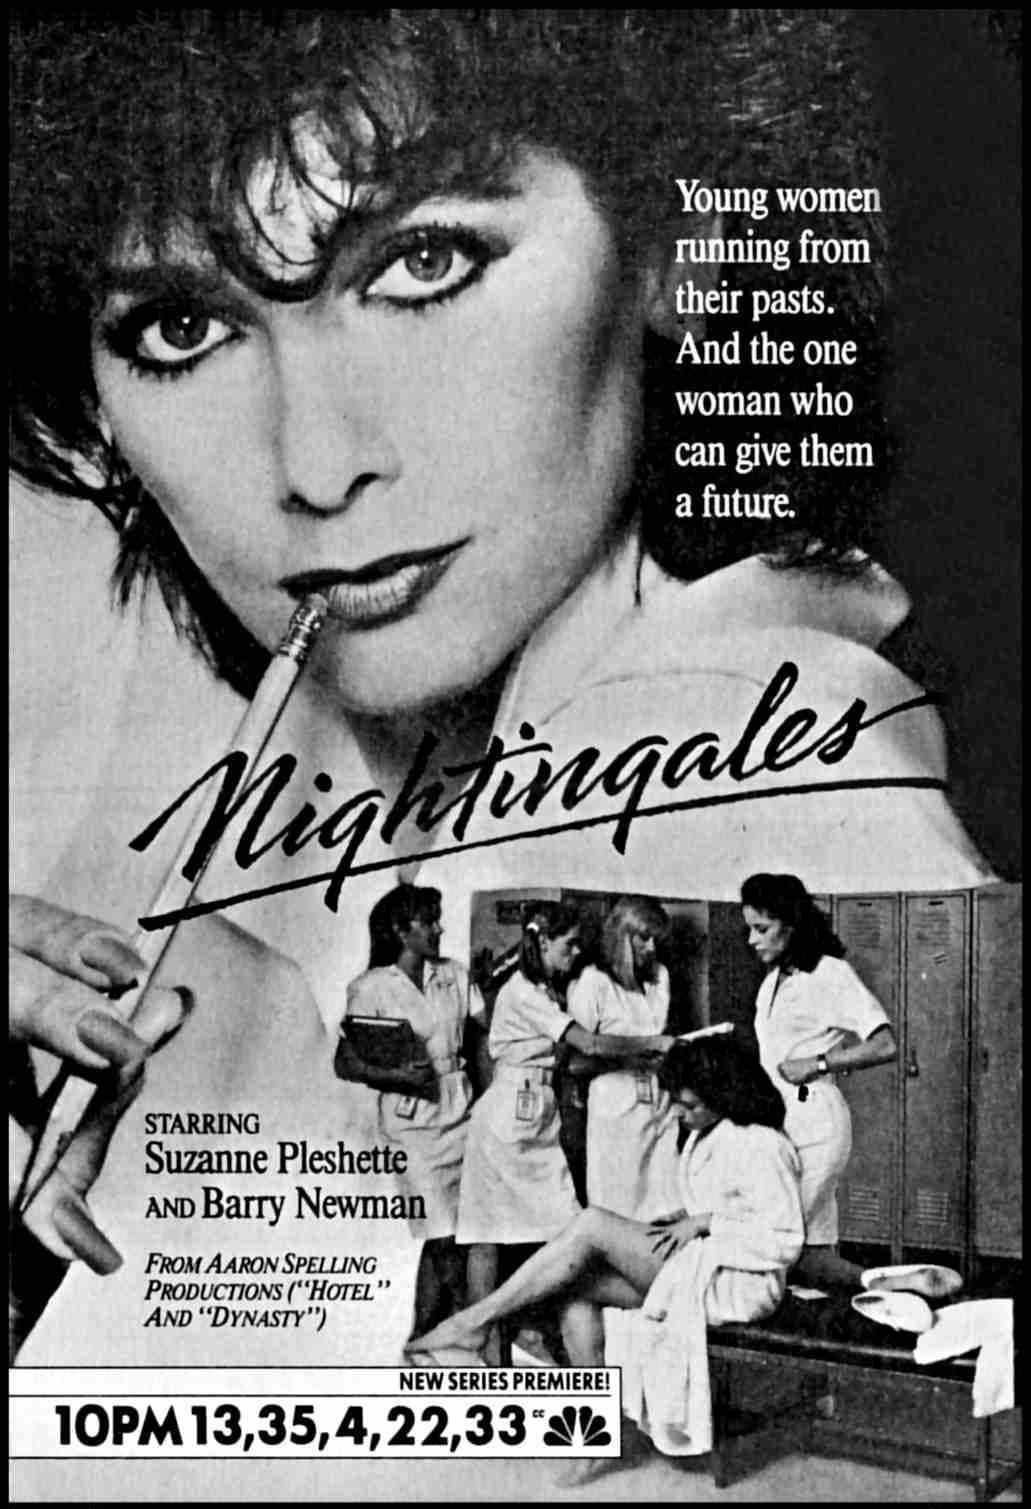 Nightingales TV Shows About Nursing